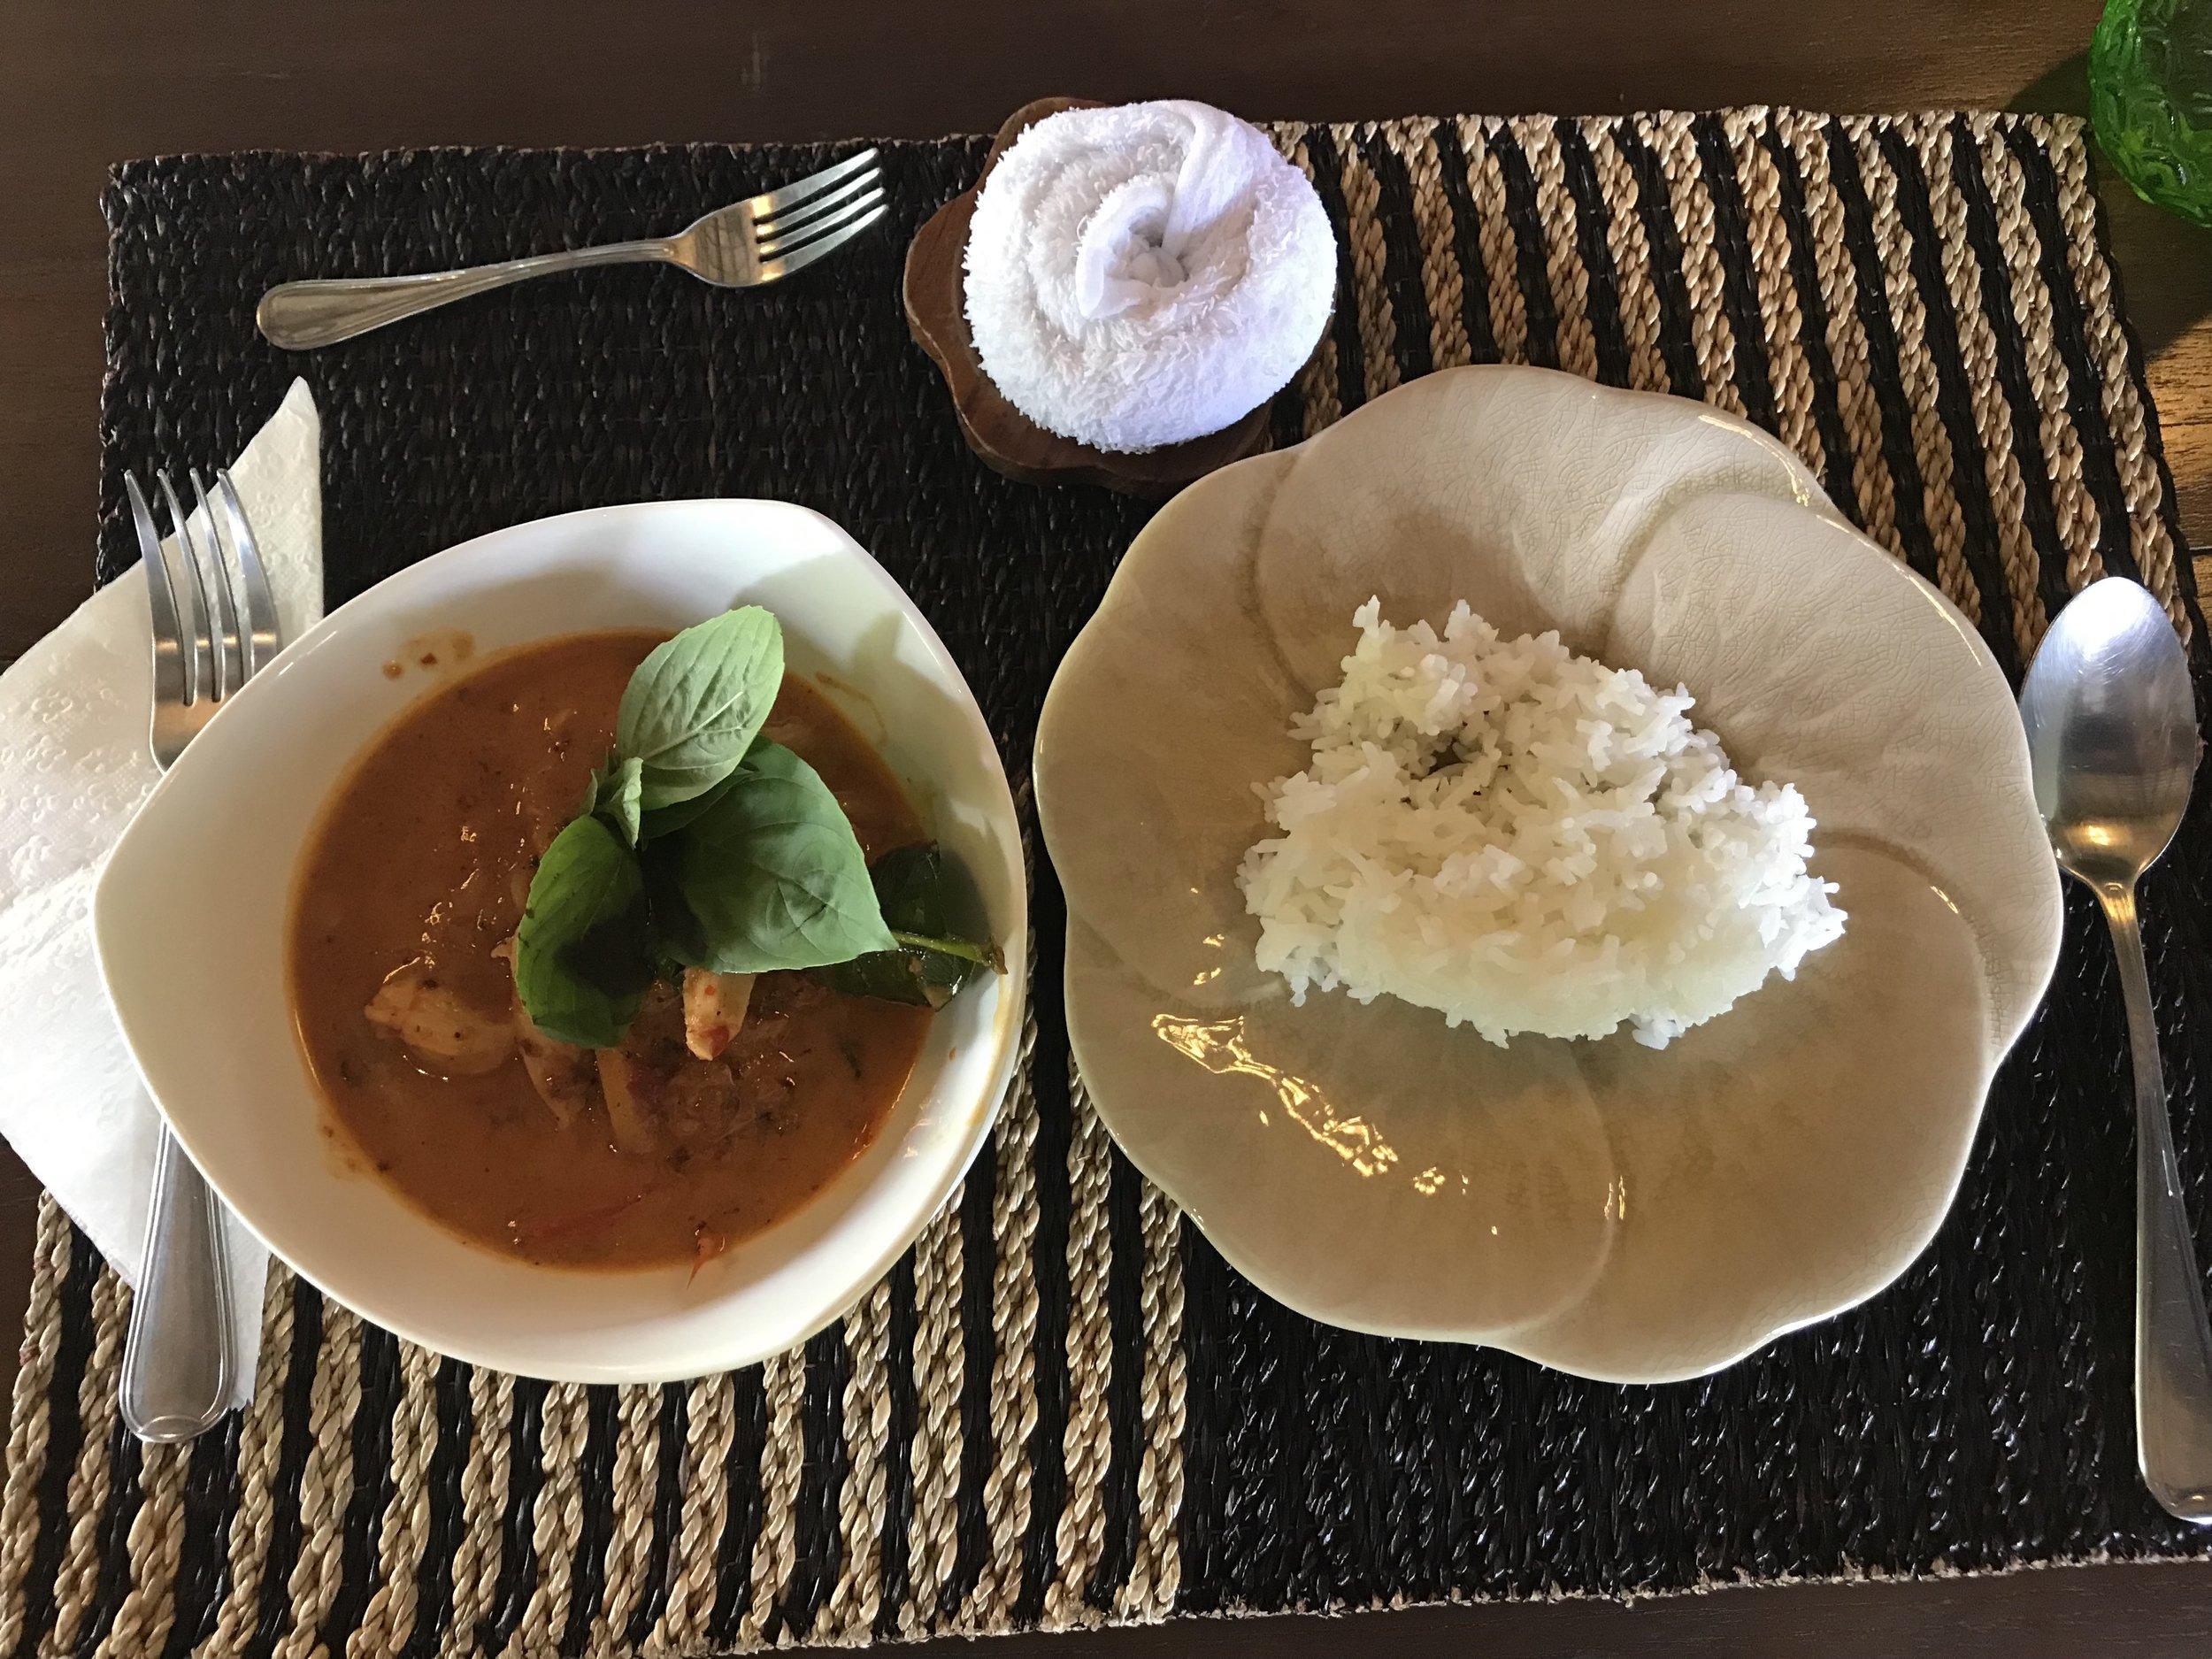 baipai school-cooking-class-dish-03-curry-chicken.JPG